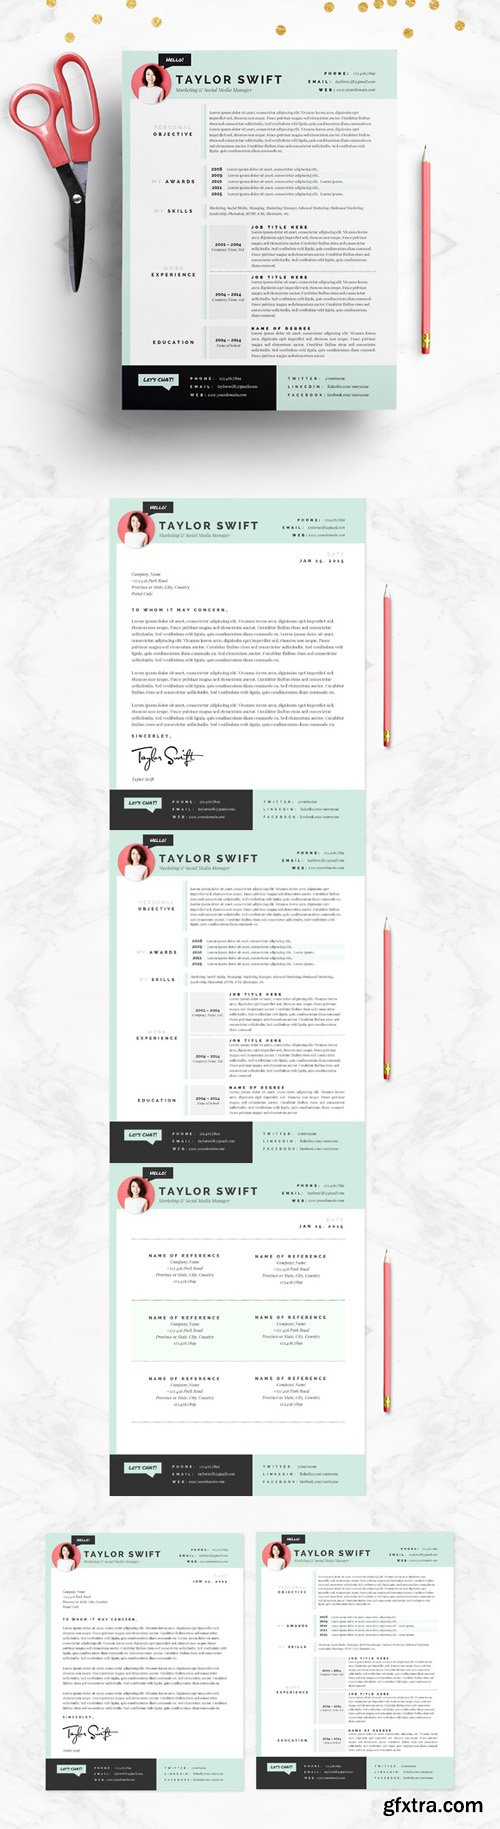 CM - Mint Resume & Cover Letter Template 138510